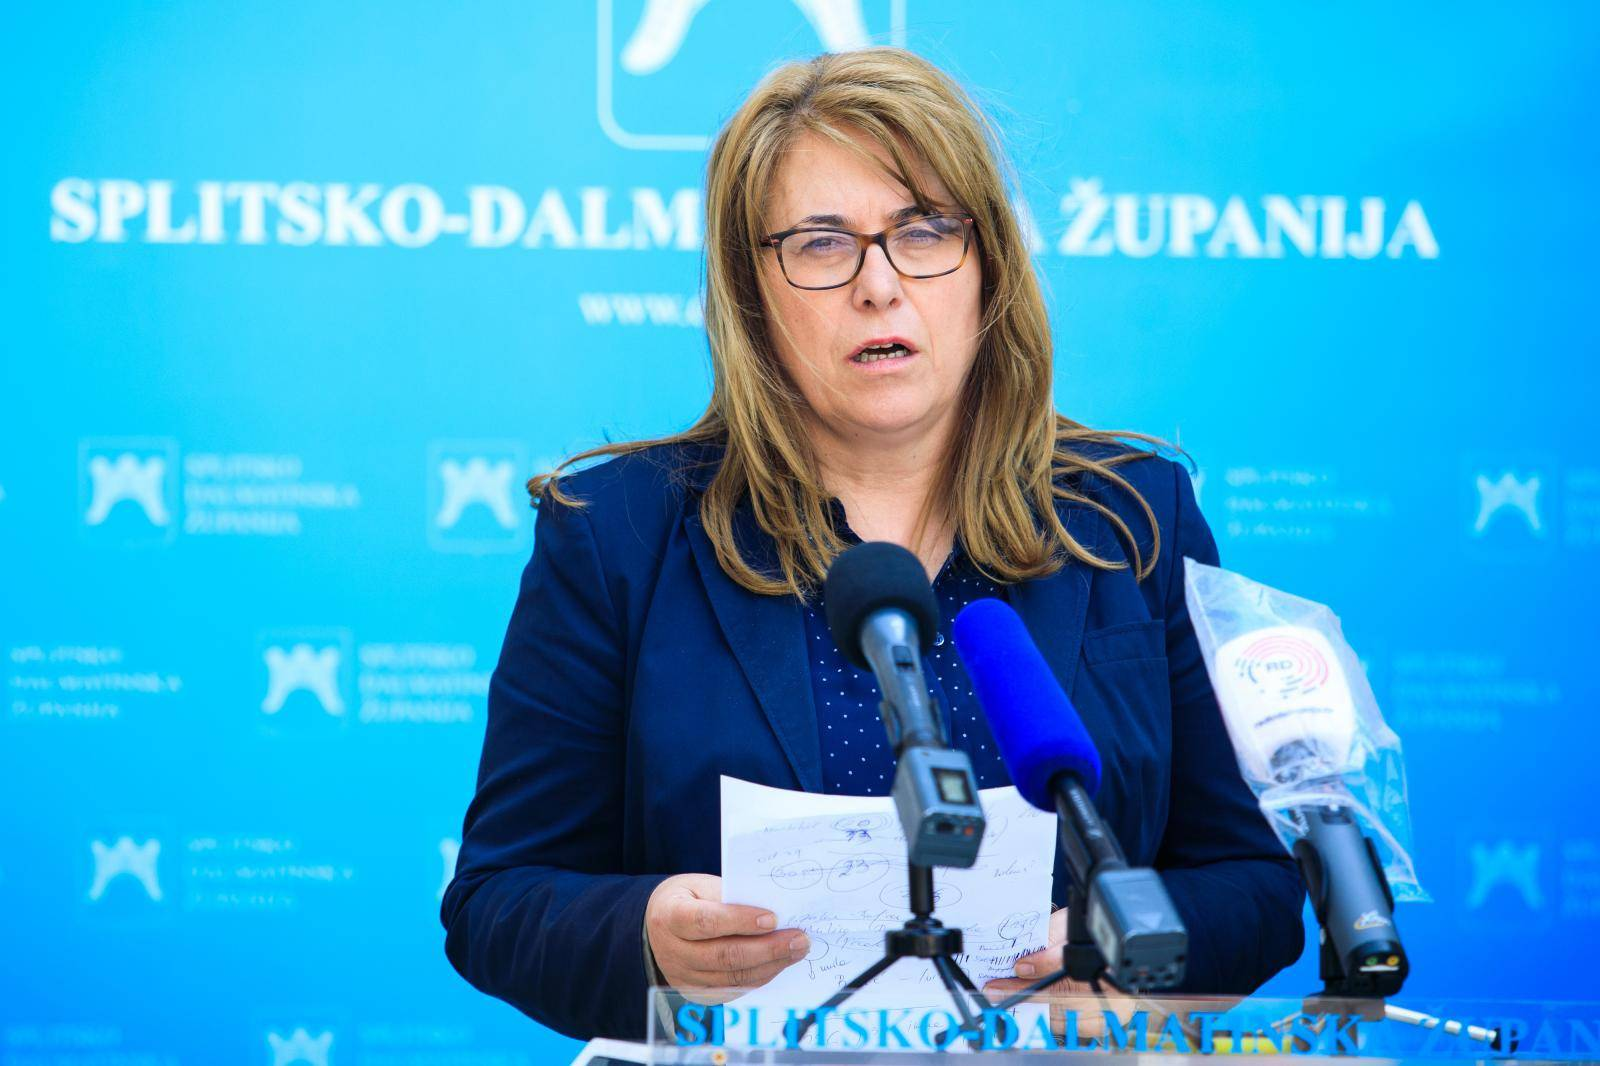 Konferencija za medije kriznog stožera Splitsko-dalmatinske županije